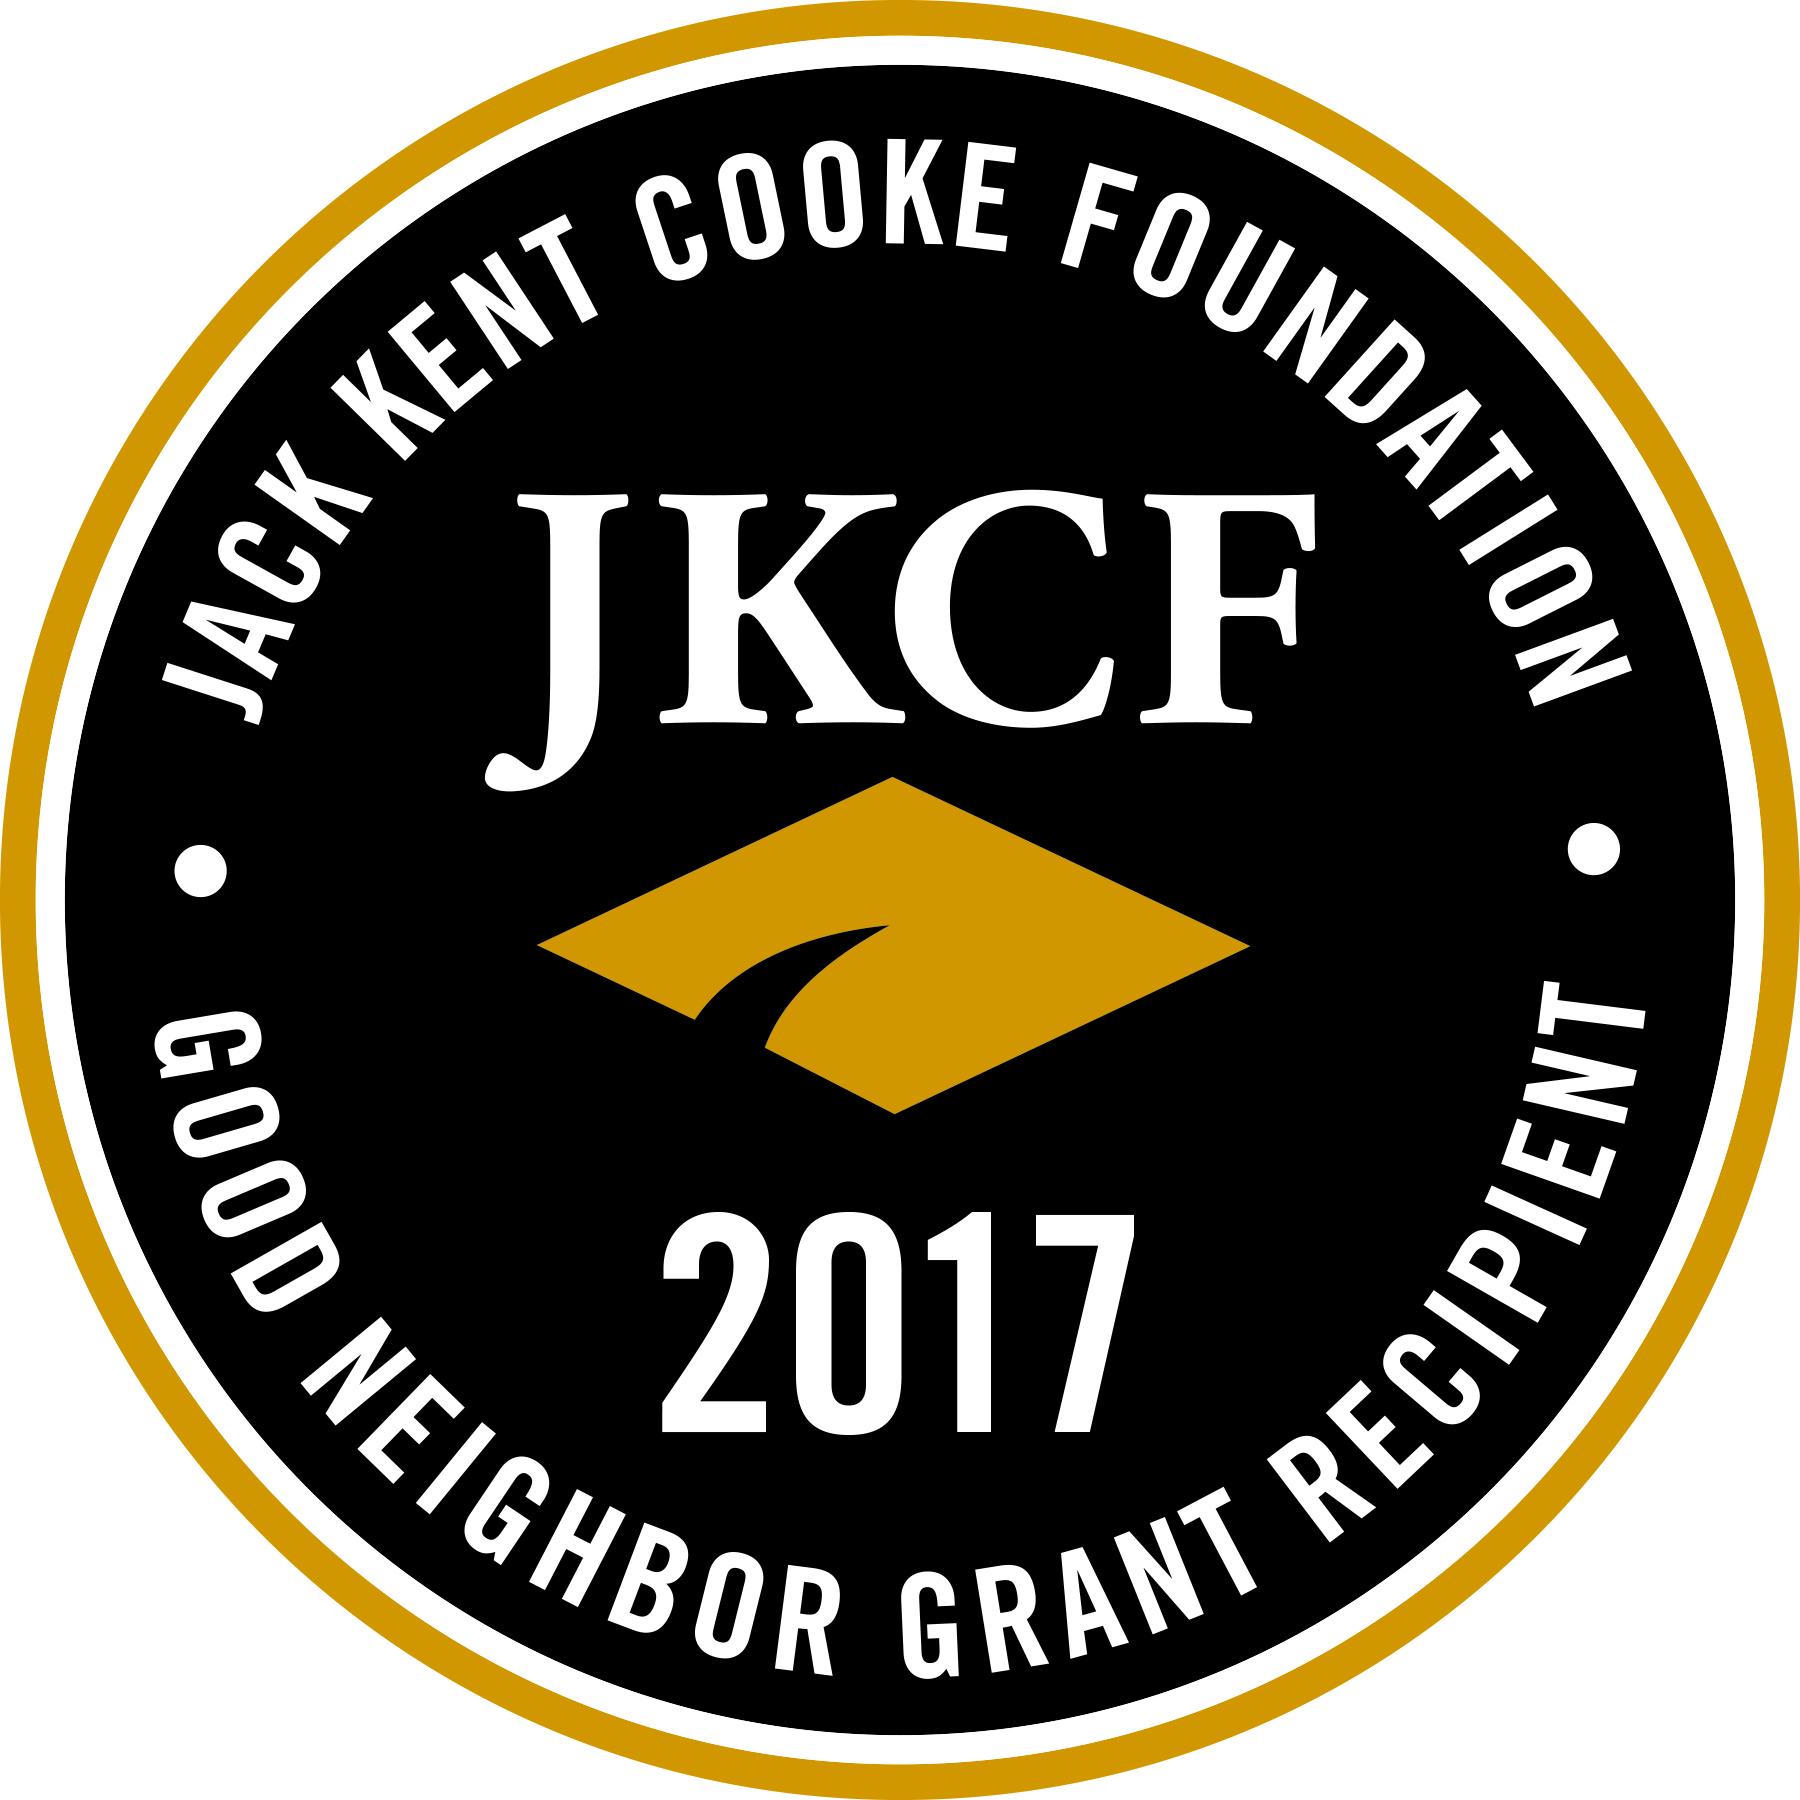 JKCF GNG Seal 2017.jpeg